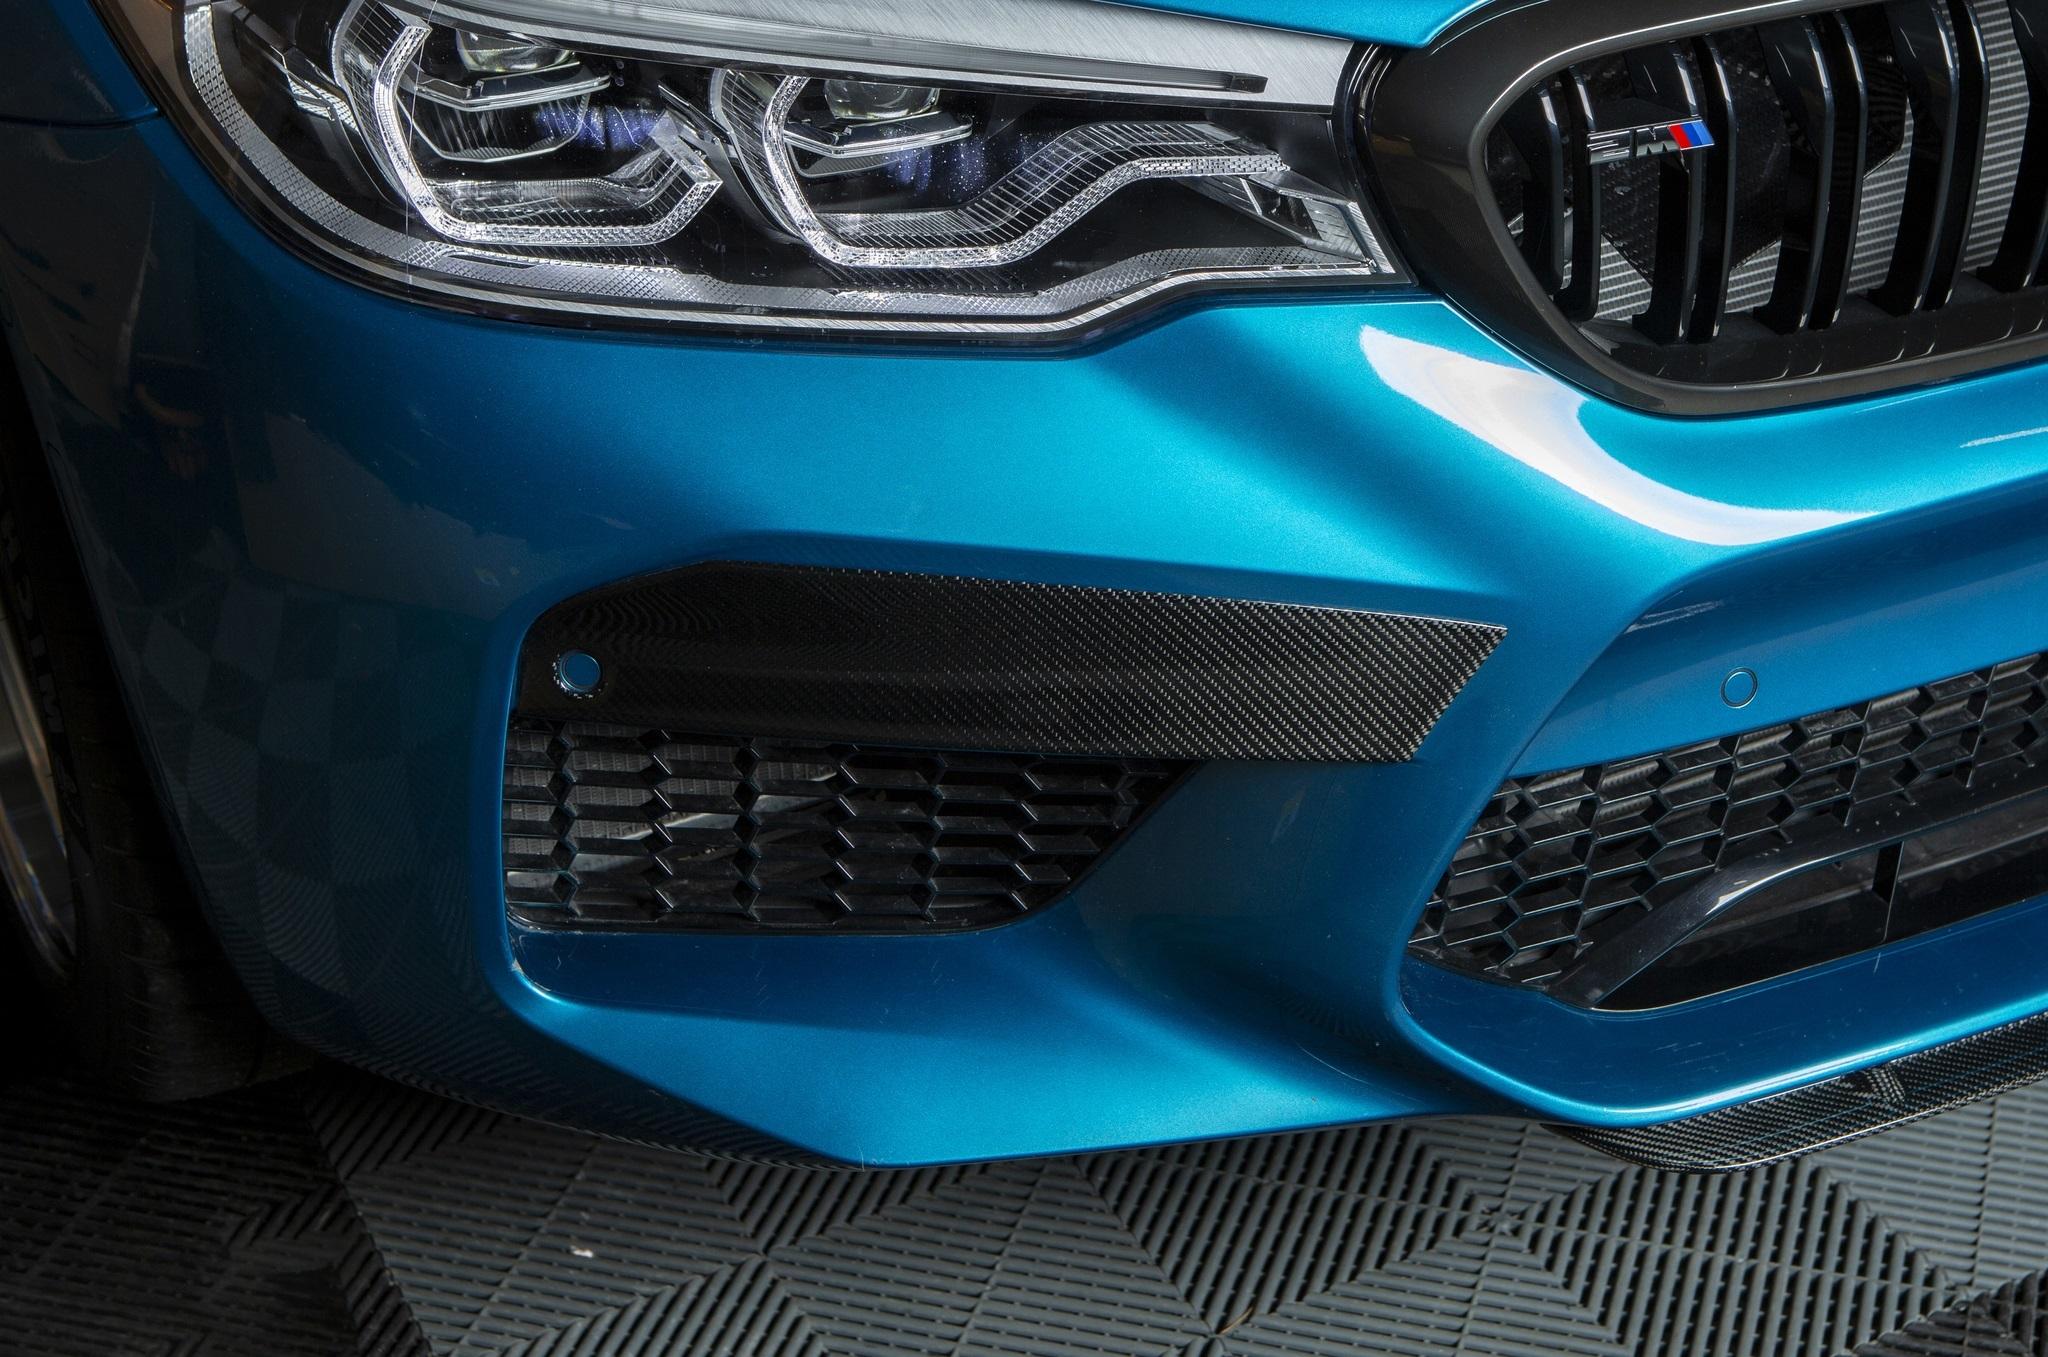 Sterckenn Carbon Fiber bumper inserts for BMW M5 F90 new model